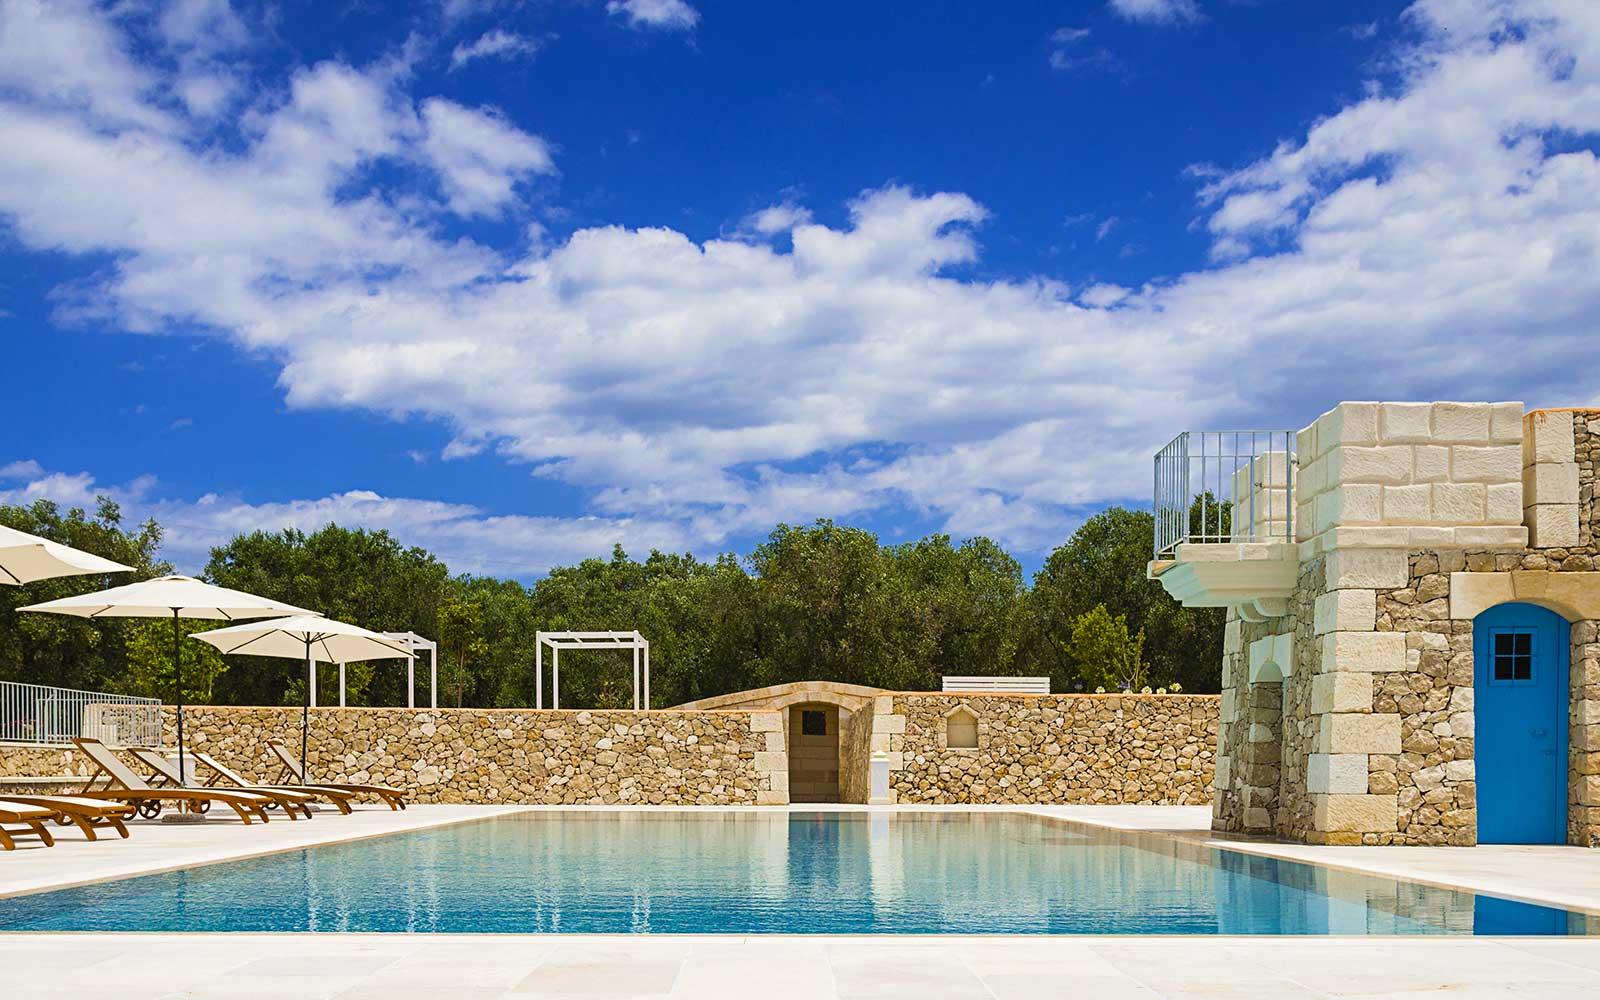 SYS Piscine relax piscina